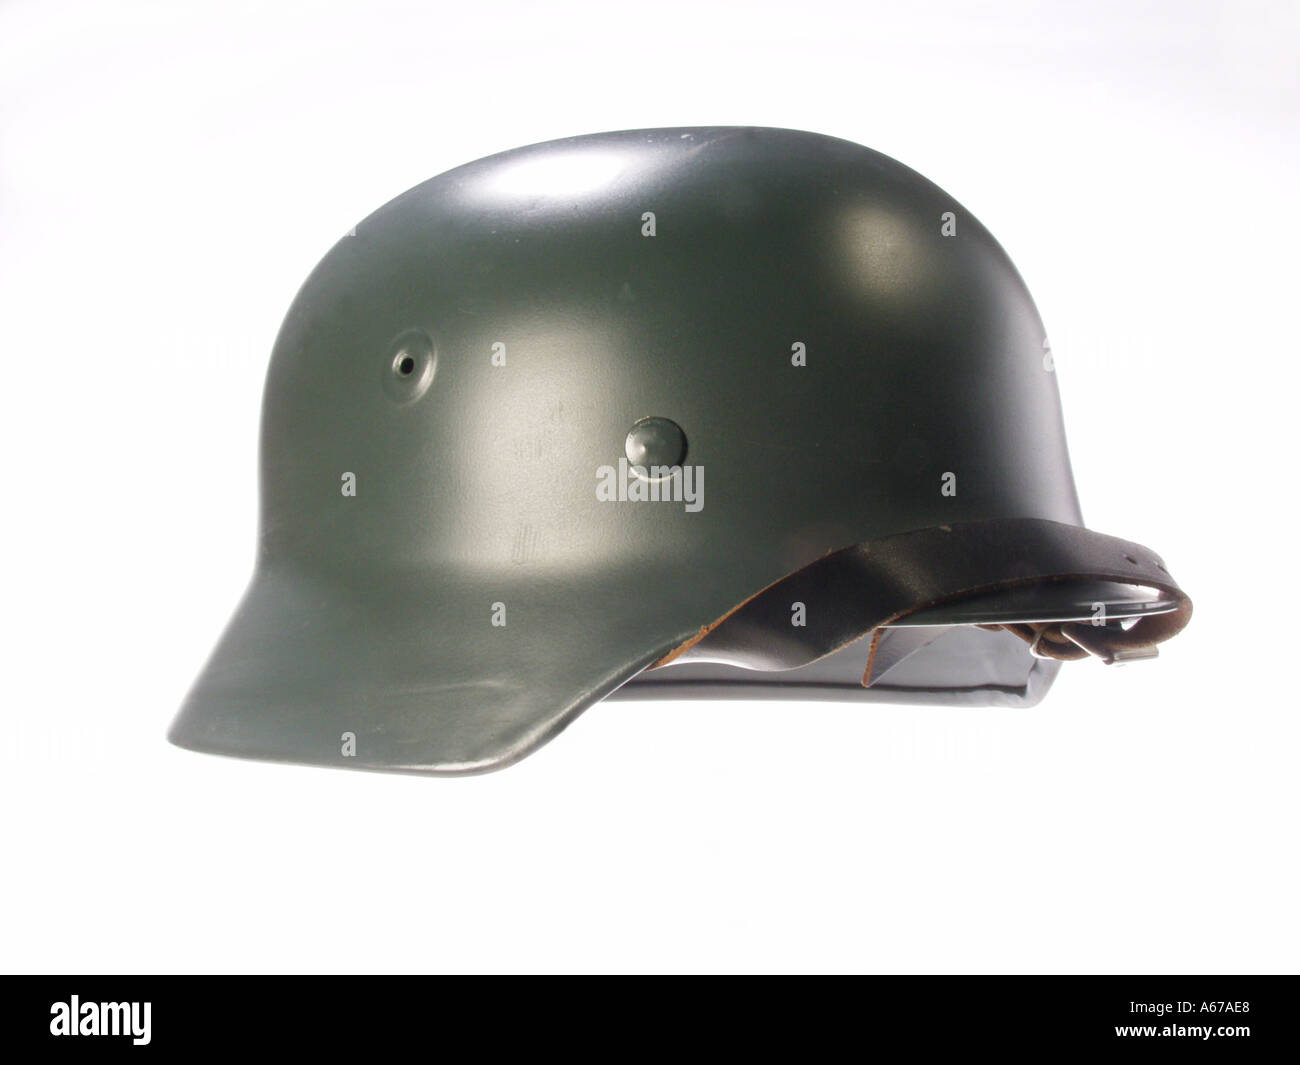 German Helmet - Stock Image